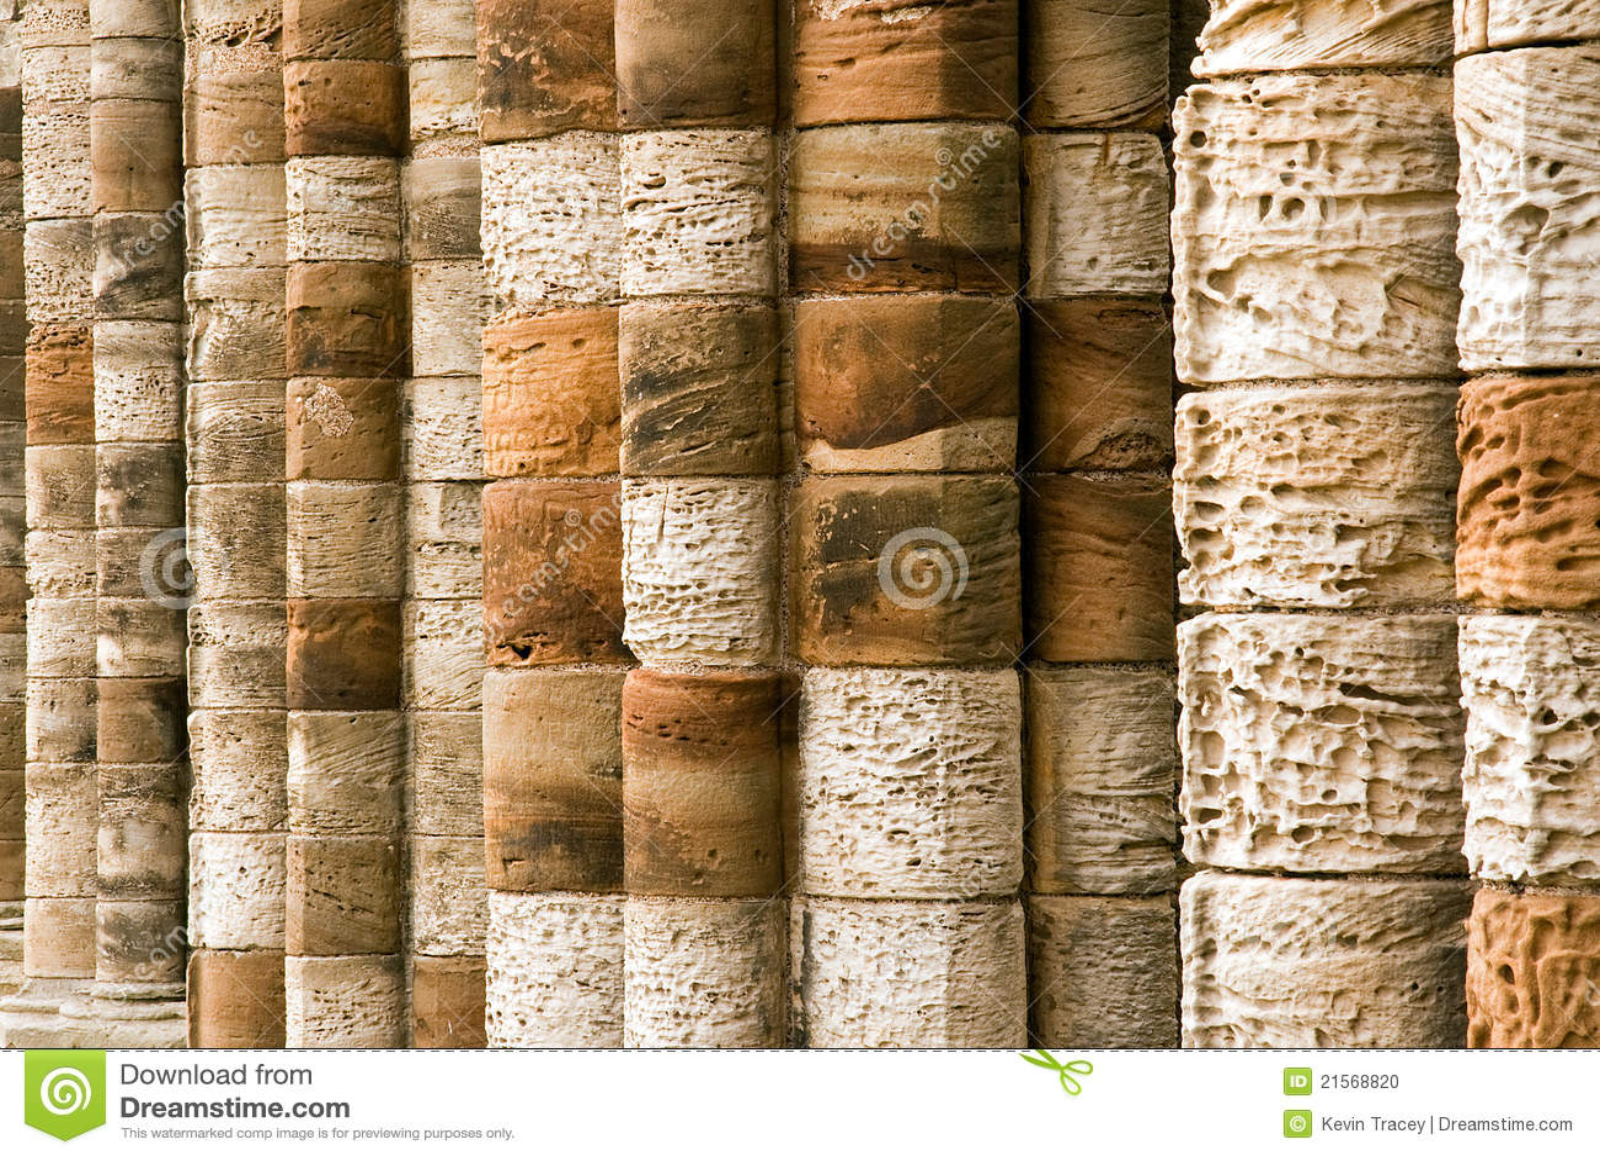 Old Stone Pillars : Old stone columns stock photo image